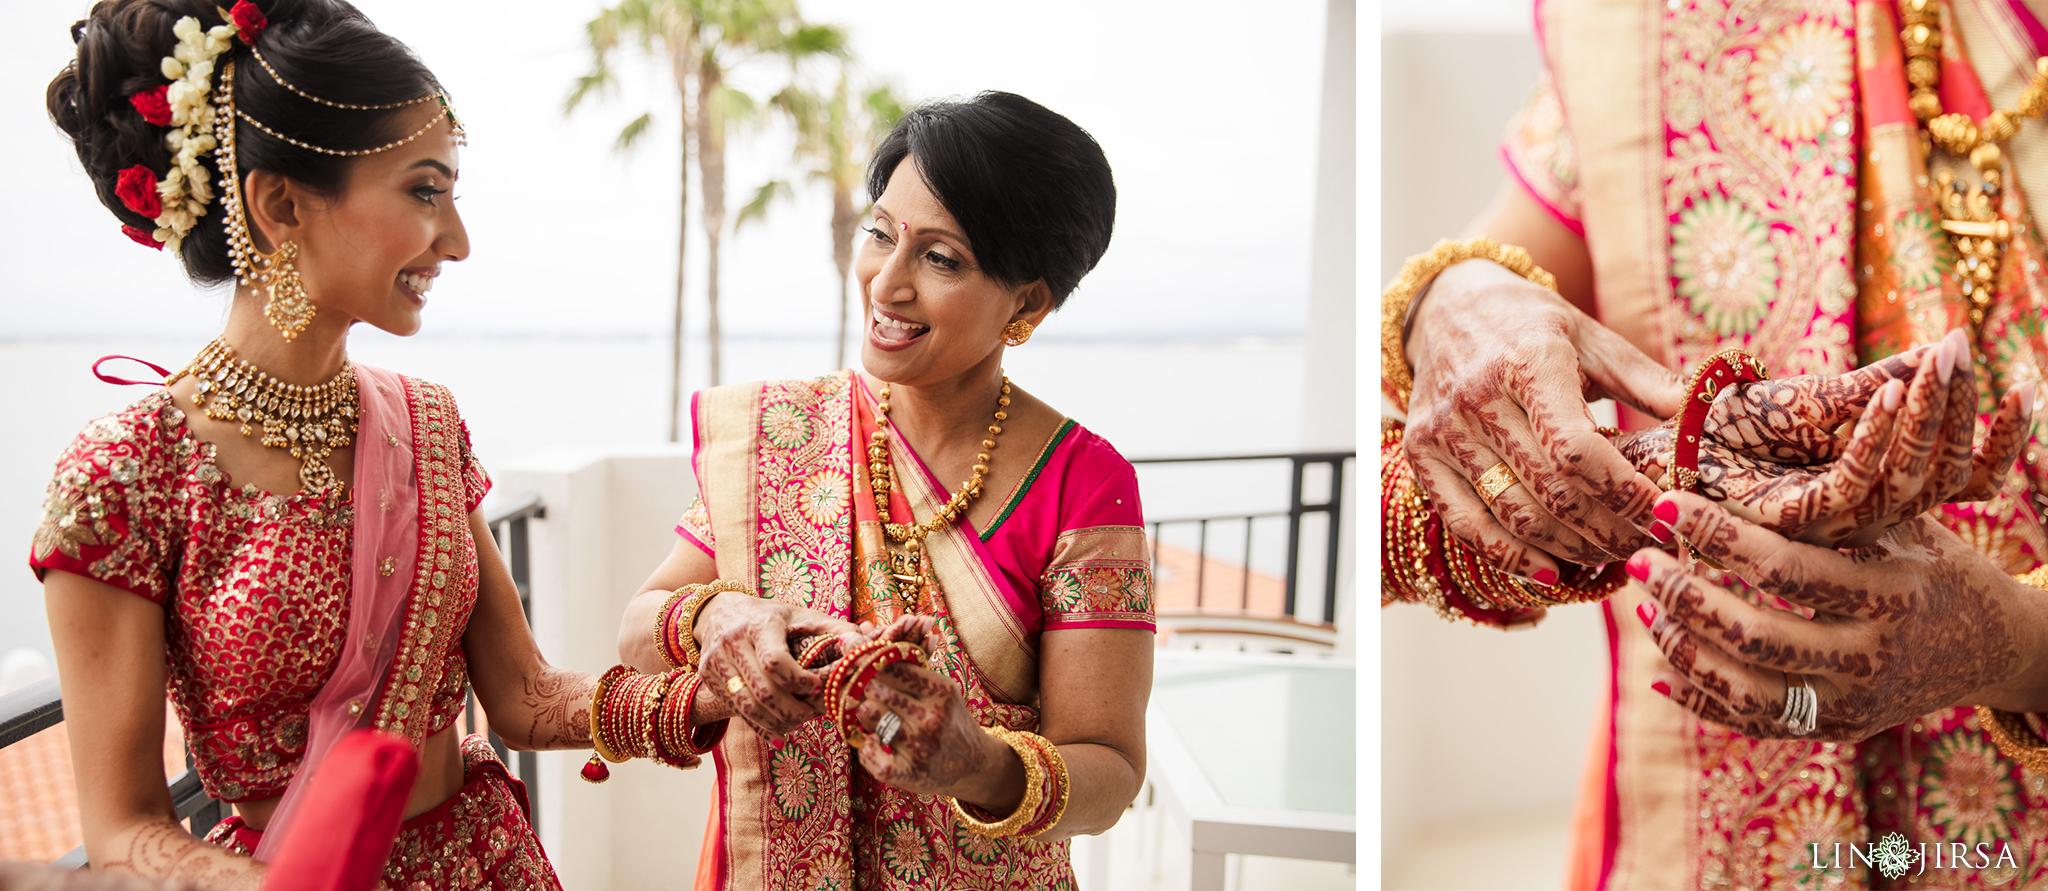 03 Loews Coronado Bay Resort San Diego Indian Wedding Photography